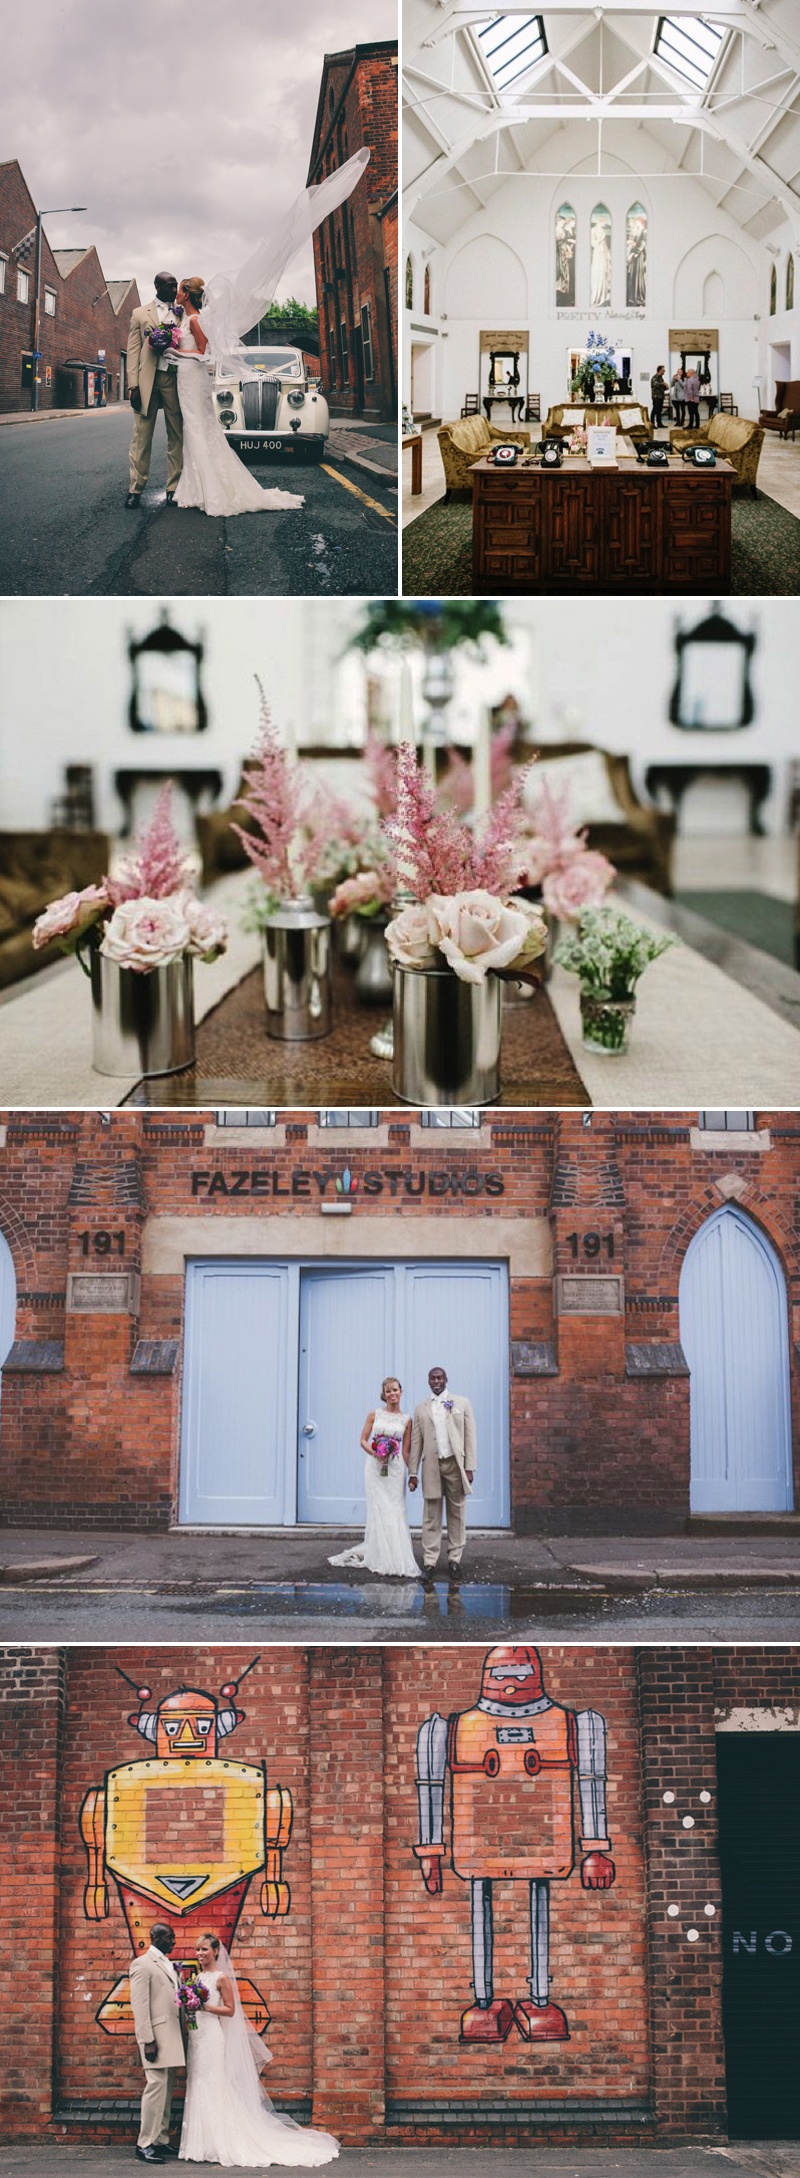 Coco Wedding Venues - Fazeley Studios - Blog Image Insert.